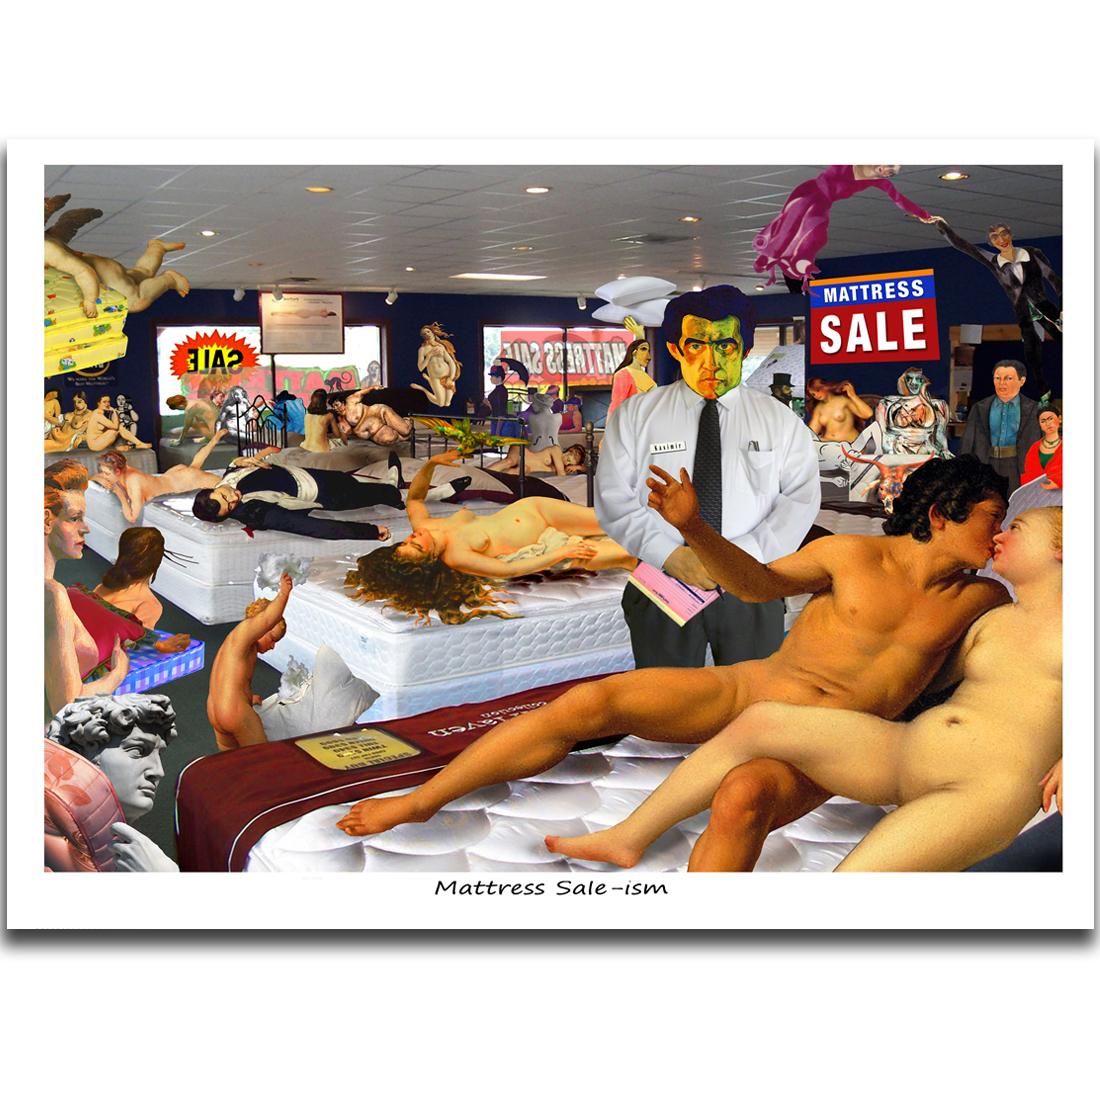 C421 Mattress Sale-ism